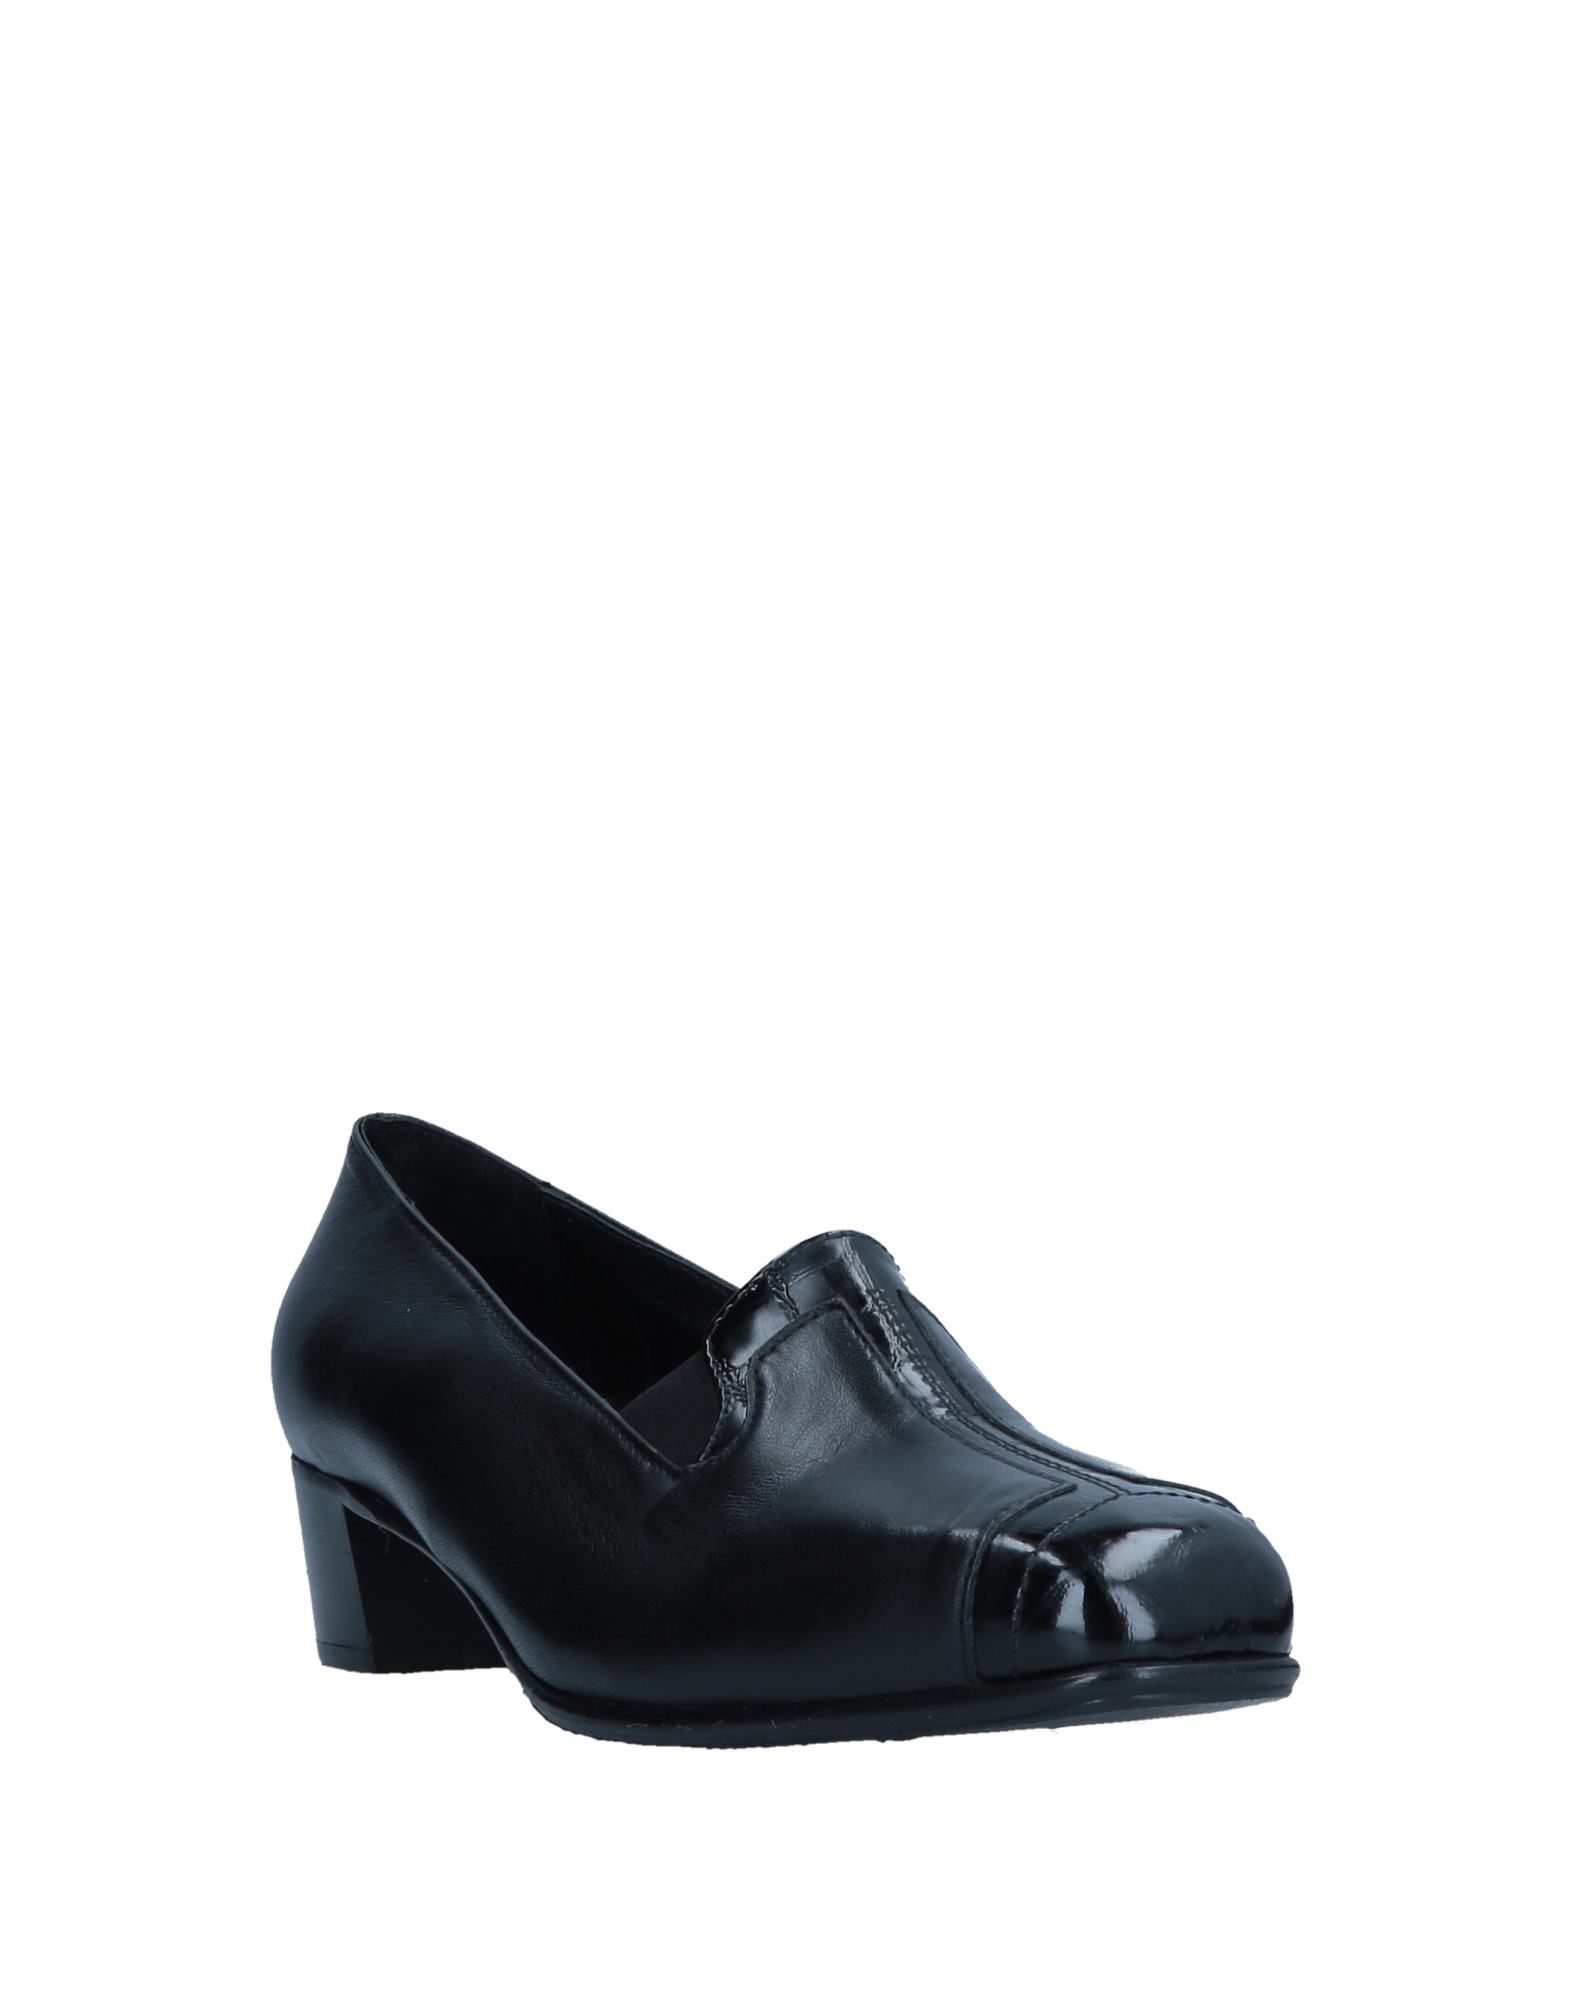 Susimoda Loafers - Women Susimoda Loafers Loafers Loafers online on  United Kingdom - 11087818BR 0f5023